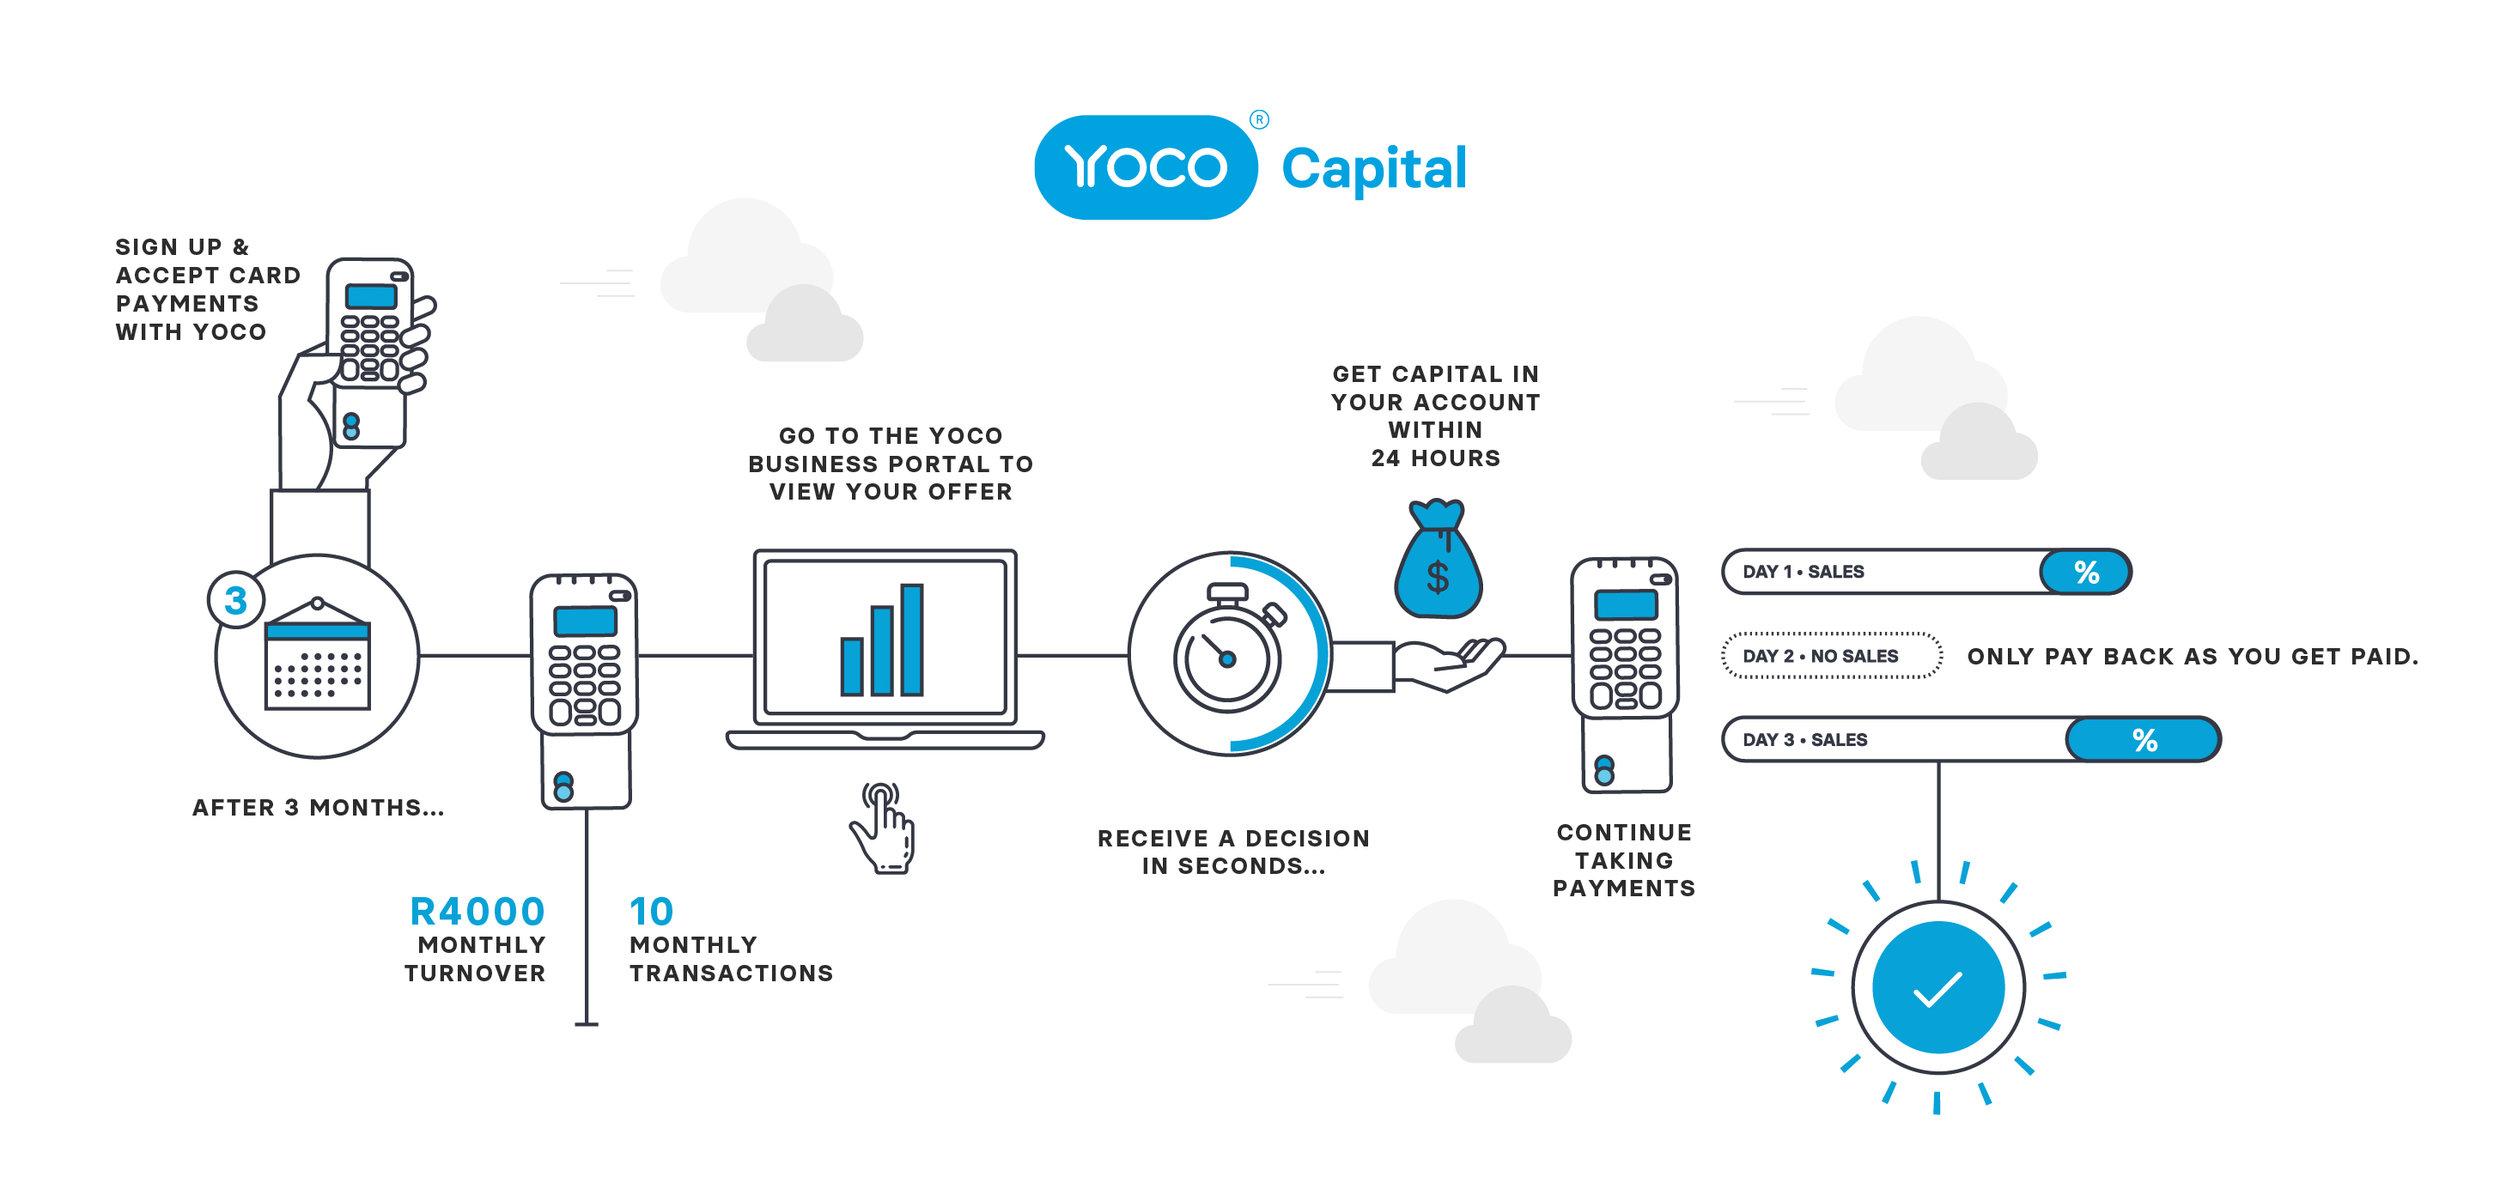 Yoco Capital Infographic.jpg